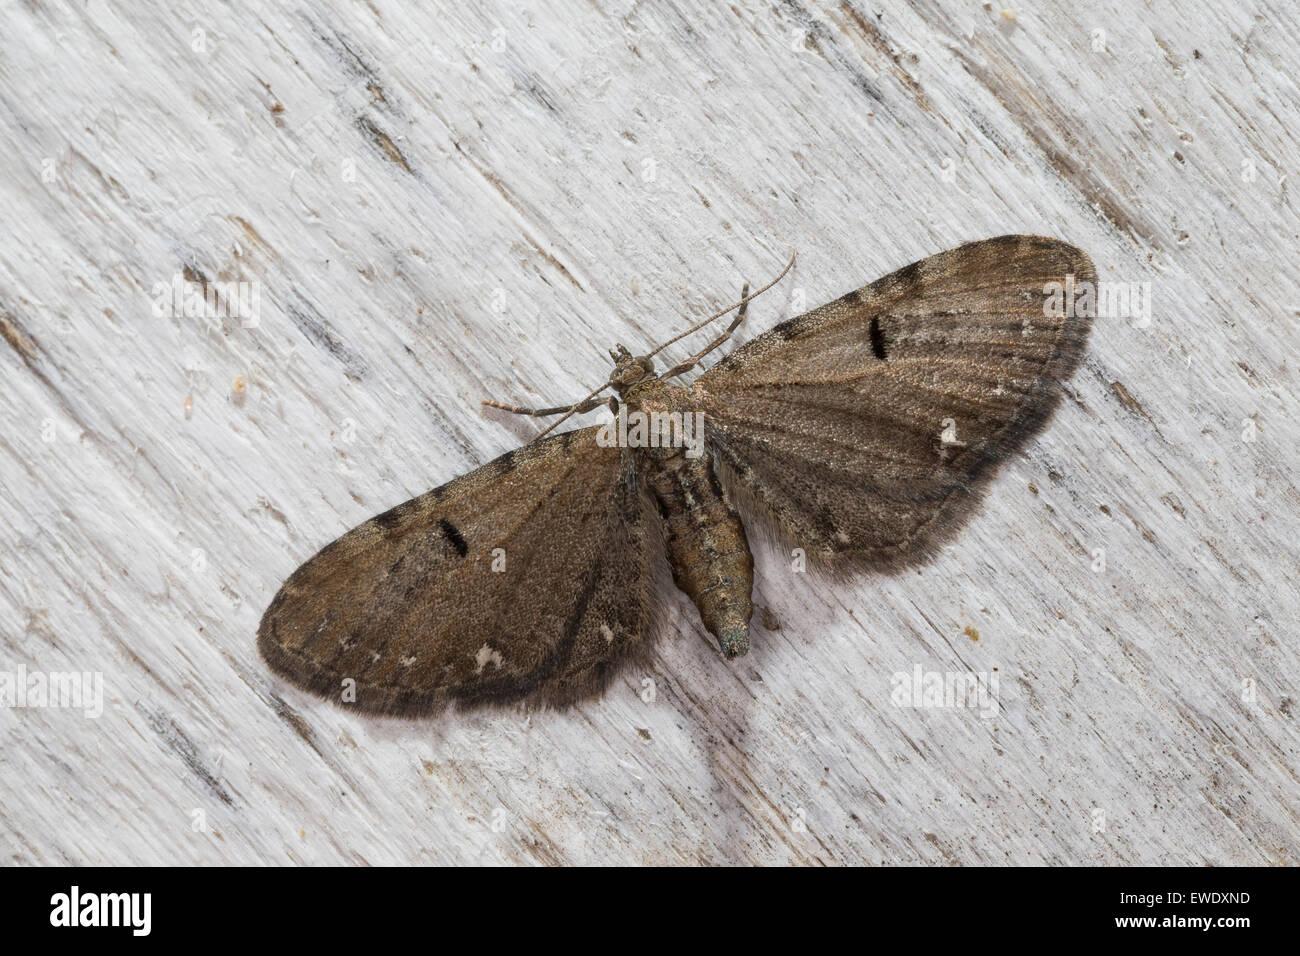 Currant pug, Hopfen-Blütenspanner, Eupithecia assimilata, l'Eupithécie du groseillier, du houblon, - Stock Image